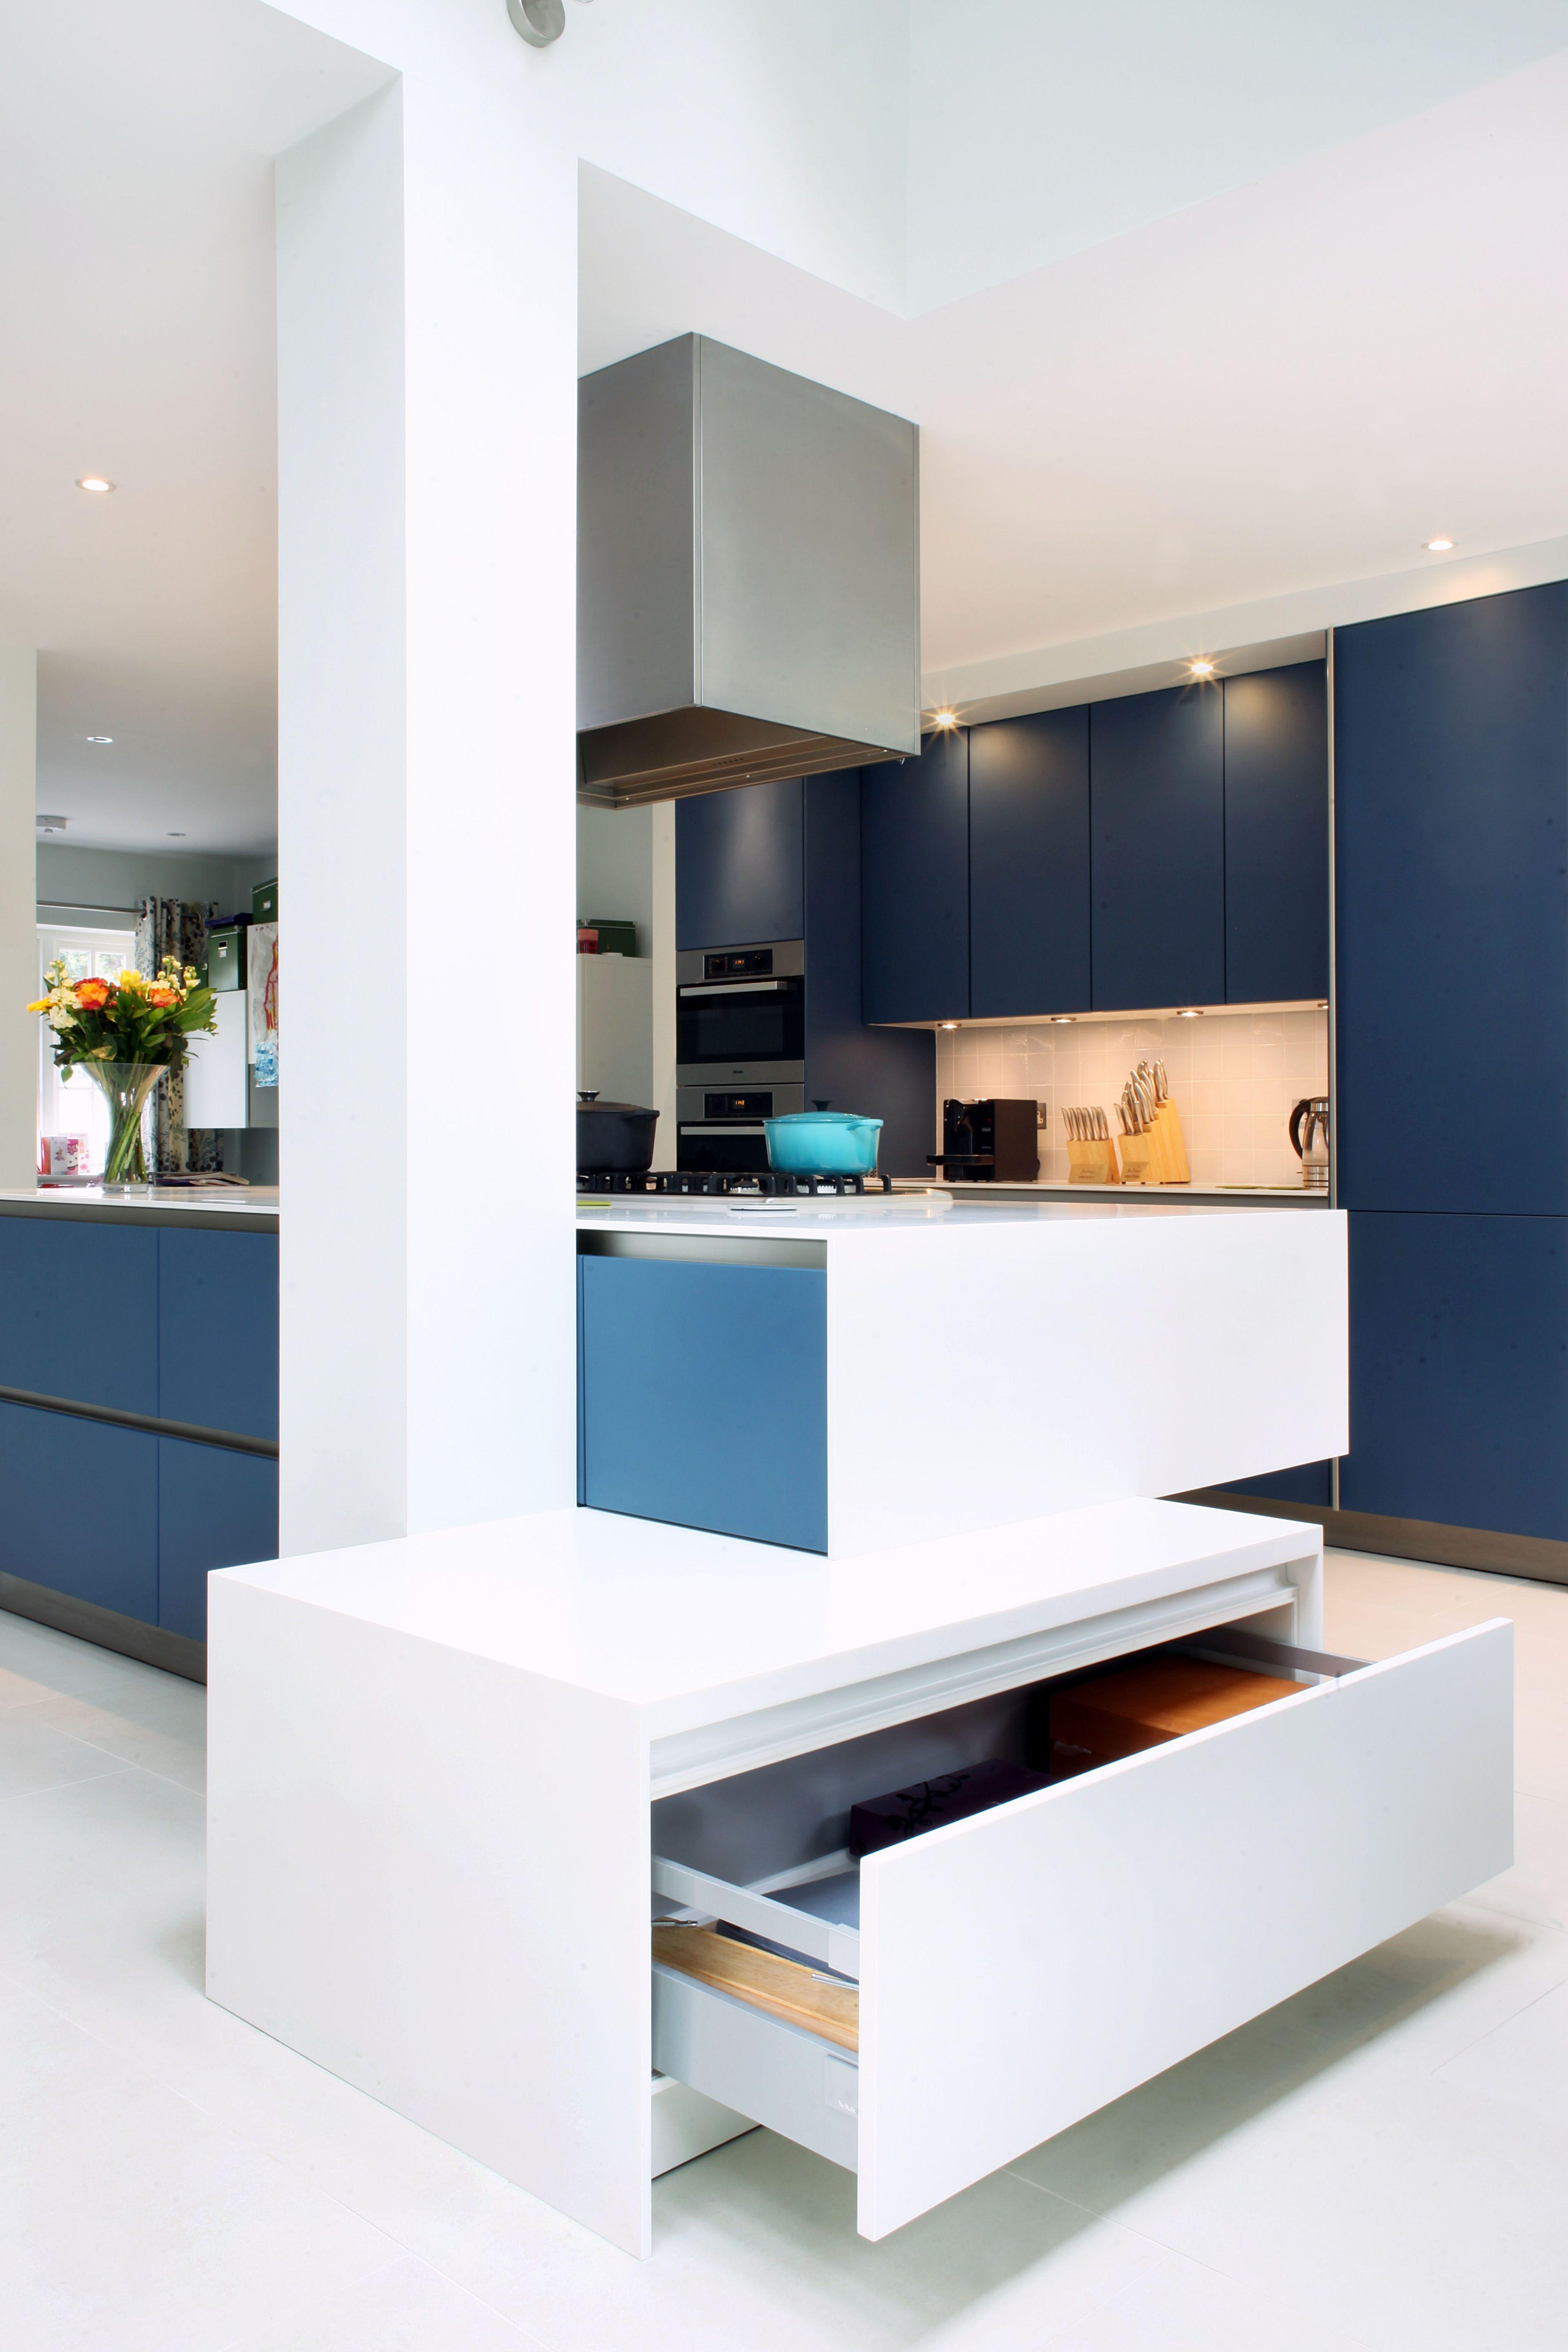 Uncategorized Designer Kitchen Appliances amersham 2 kitchen design drawing room blue lacquer cabinetry designer white corian worktop miele